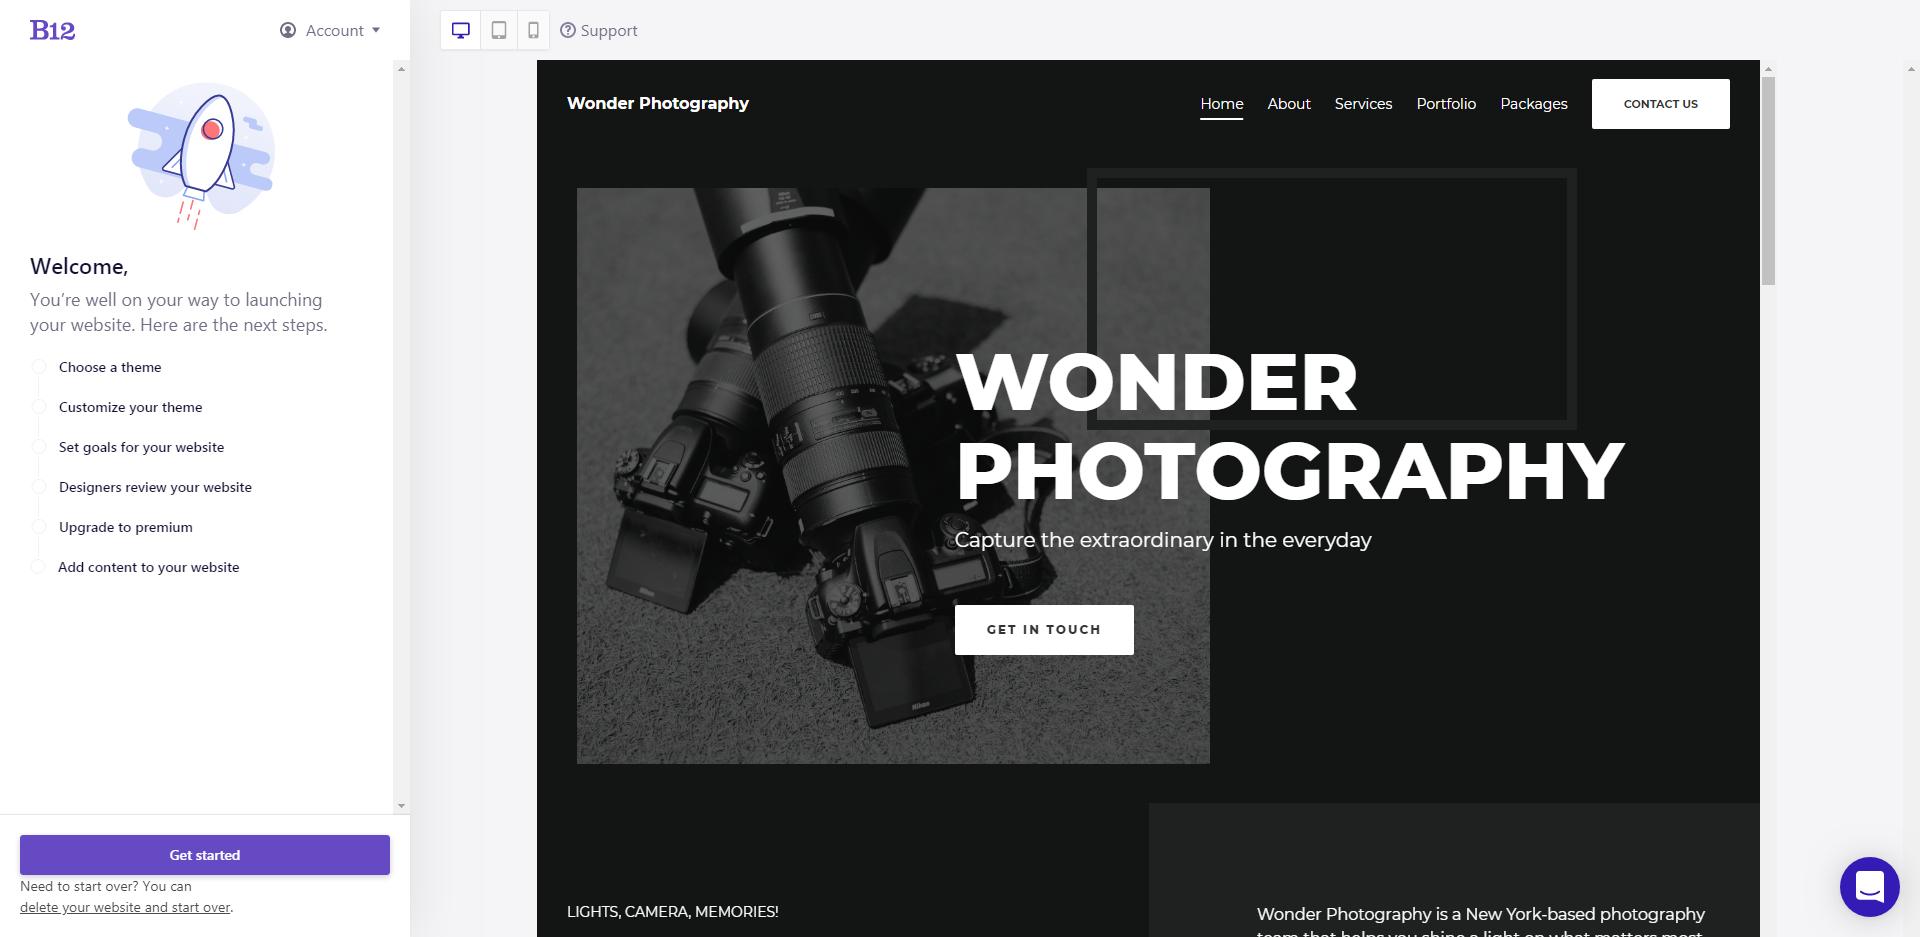 B12 website